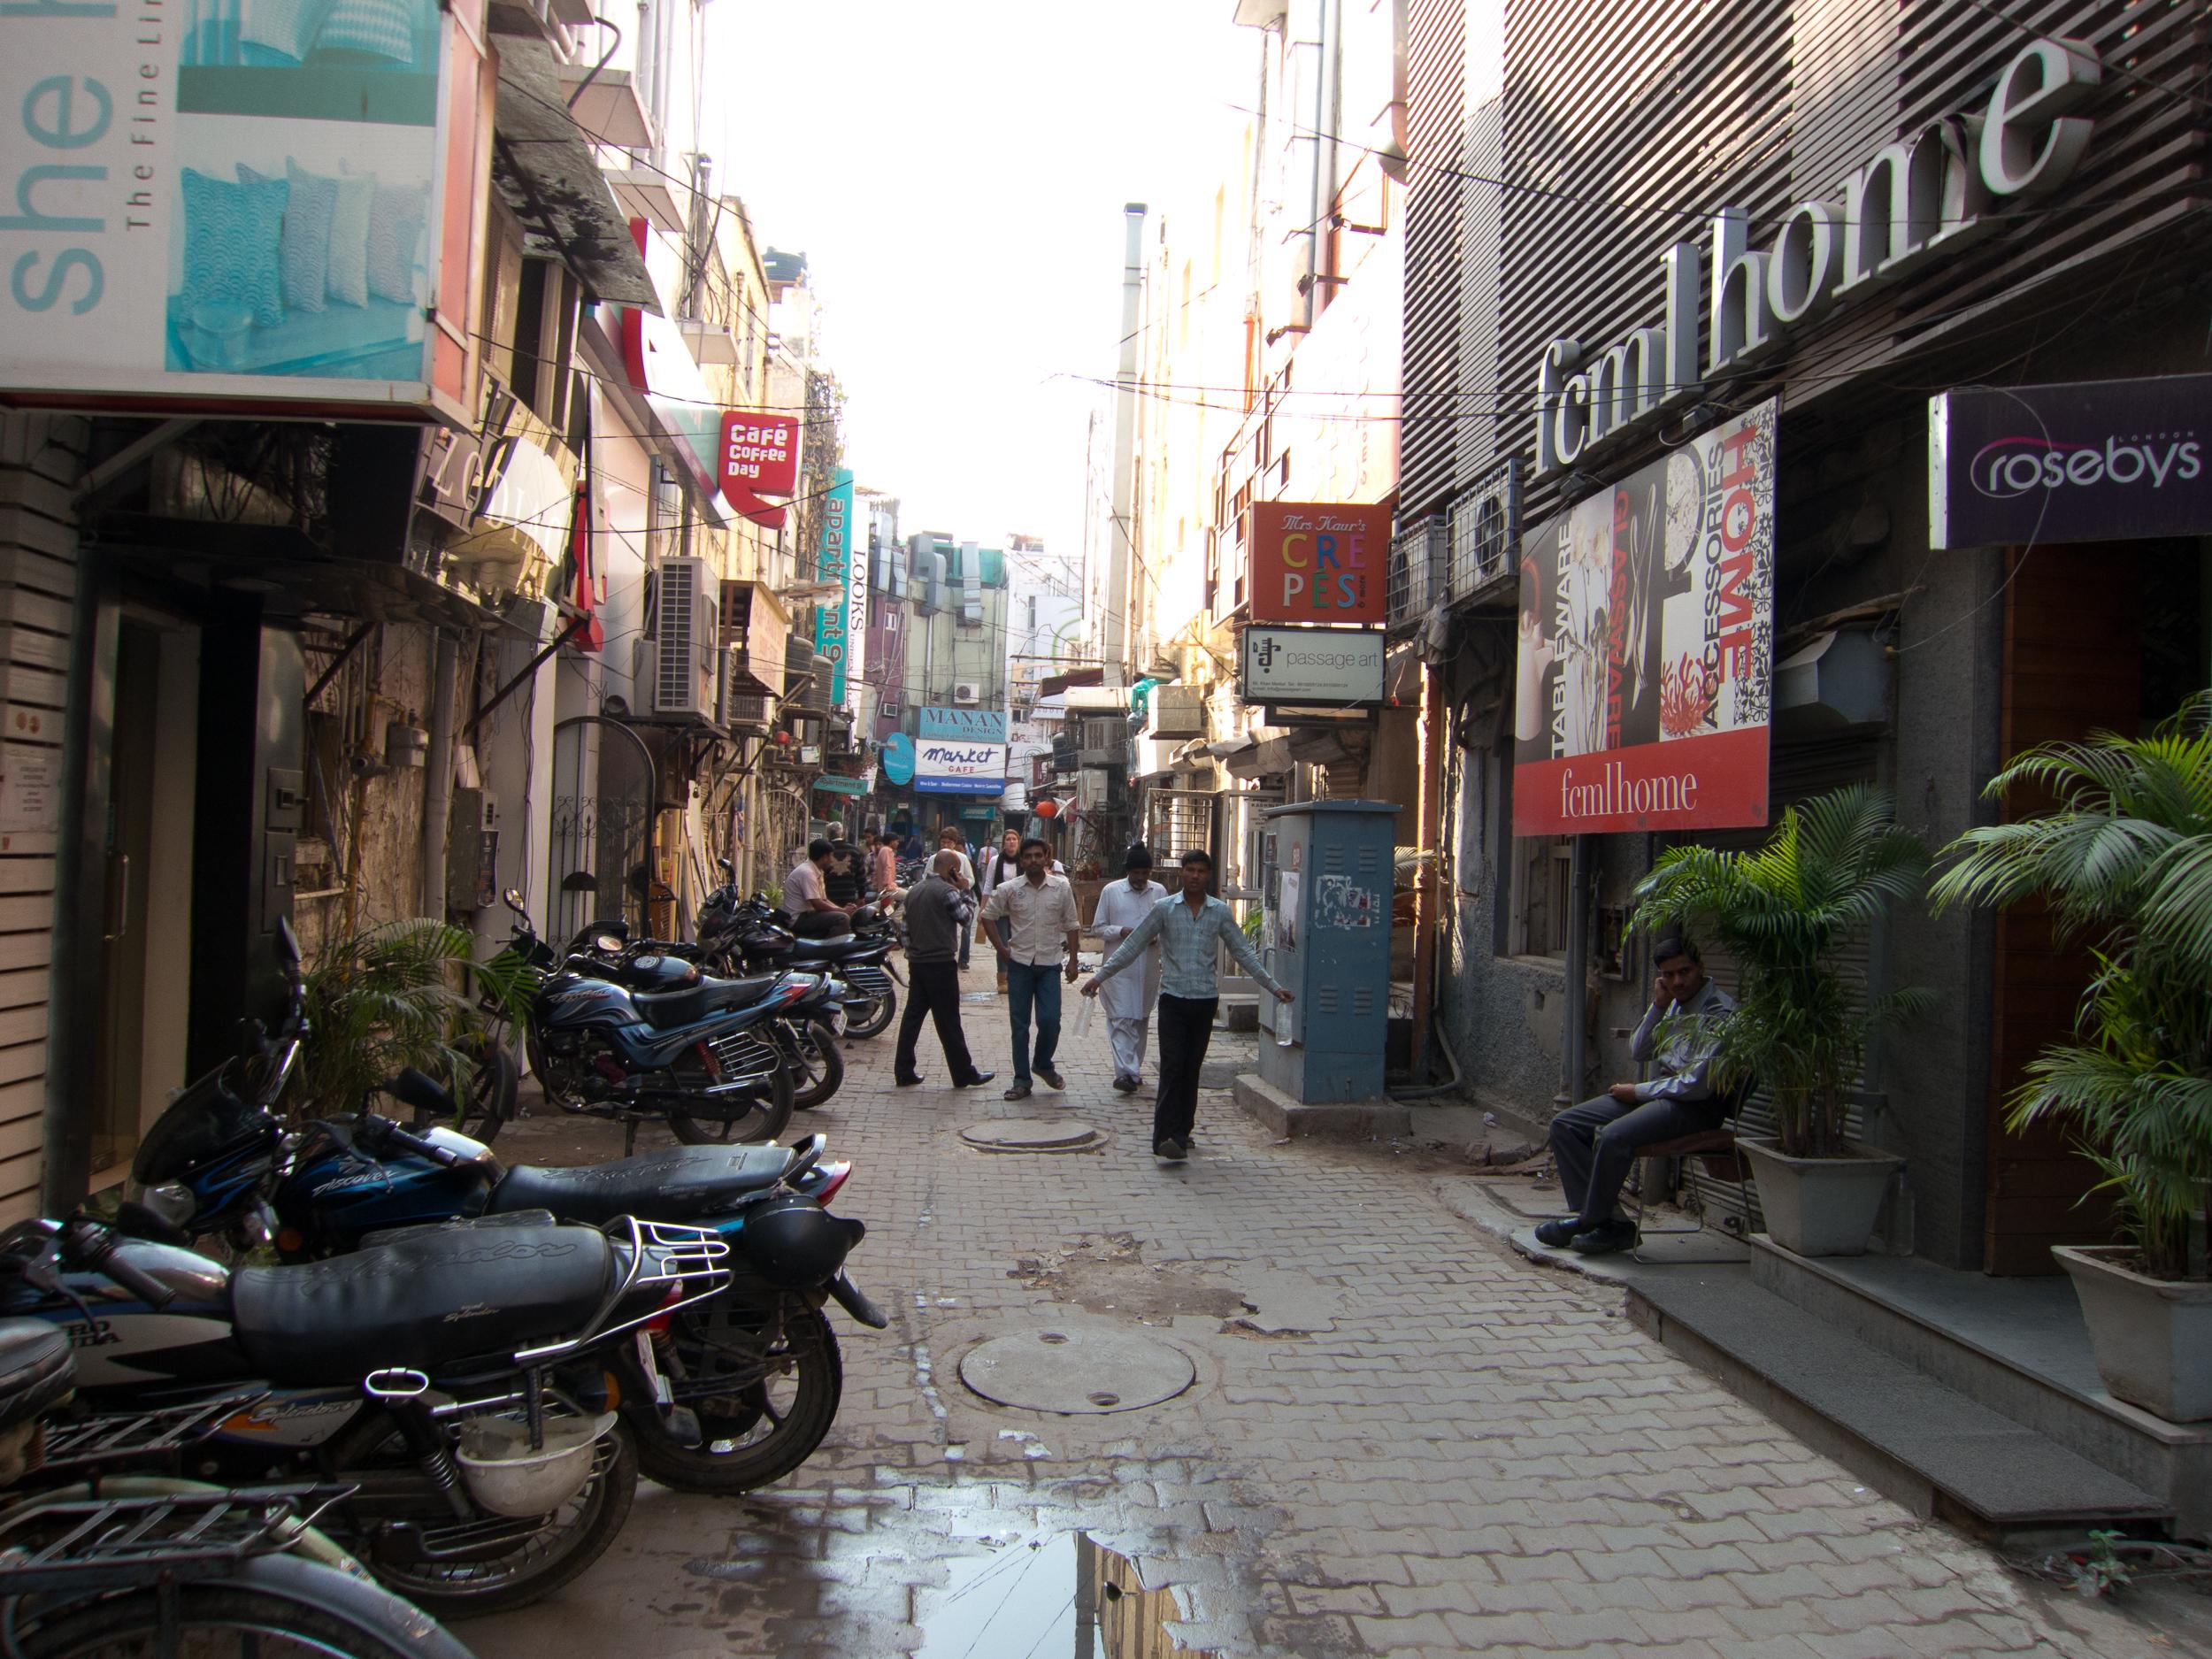 Khan Market Amazing Market to Shop in Delhi